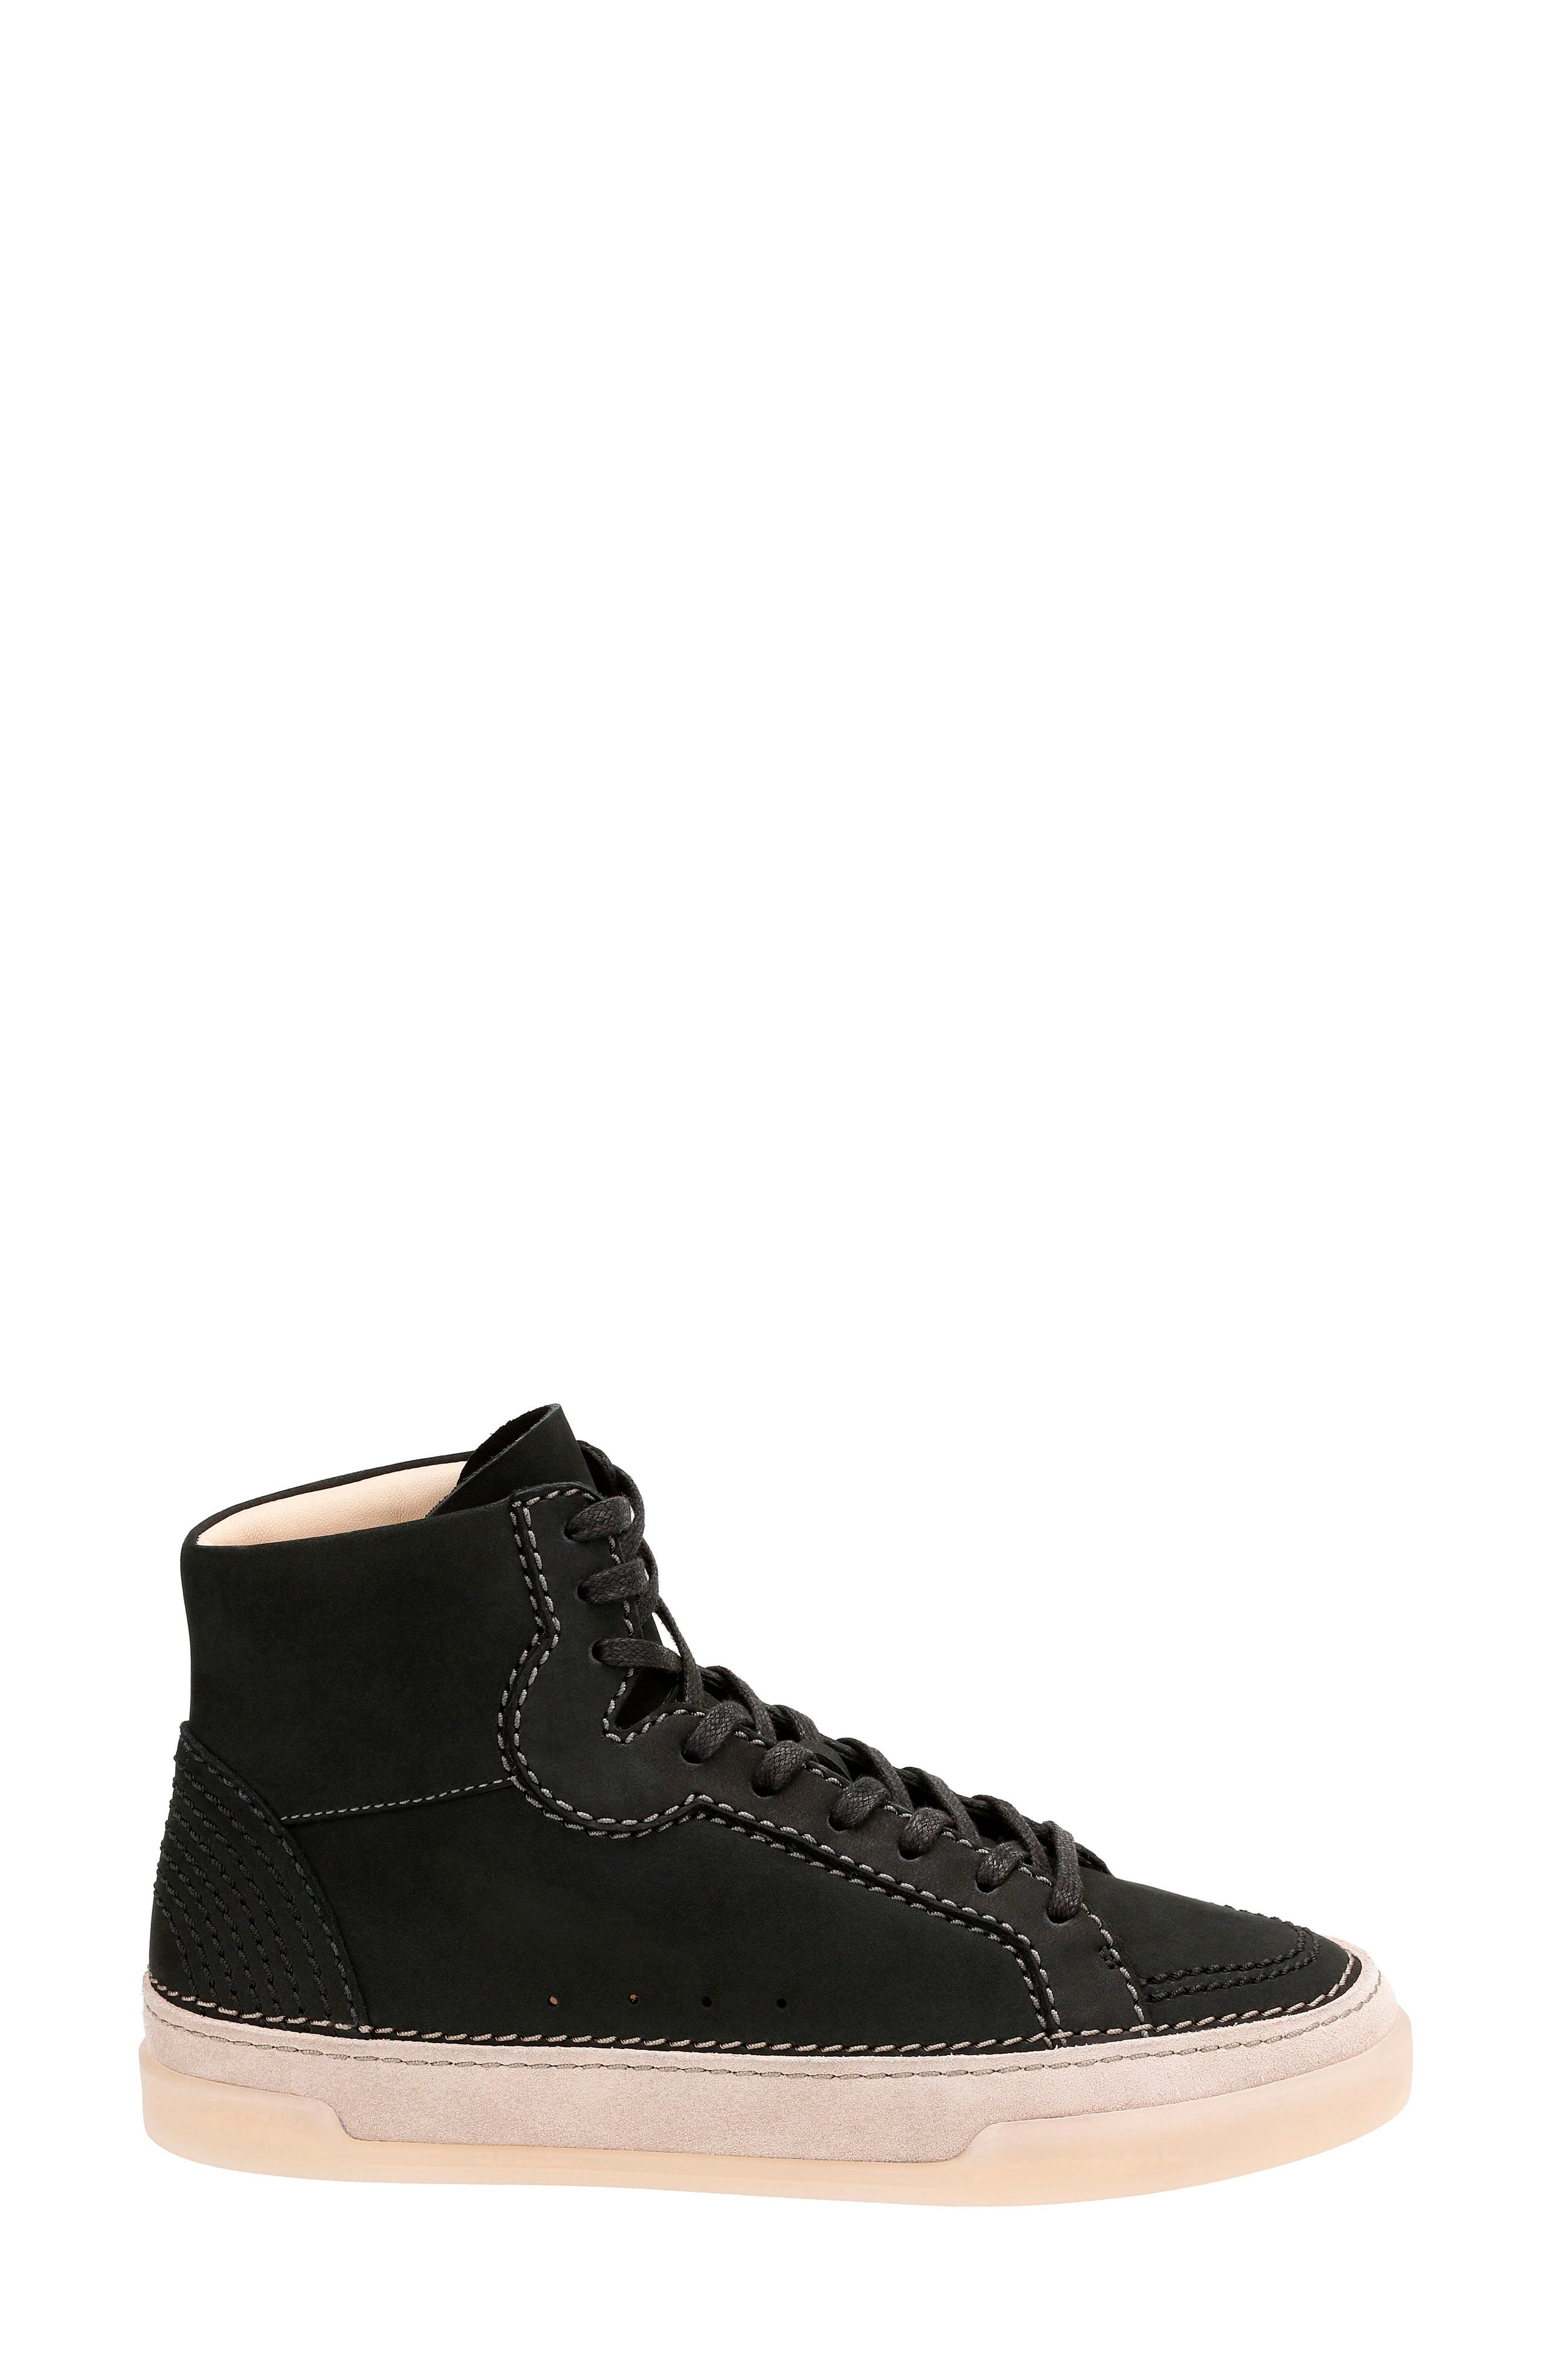 Hidi Haze High Top Sneaker,                             Alternate thumbnail 5, color,